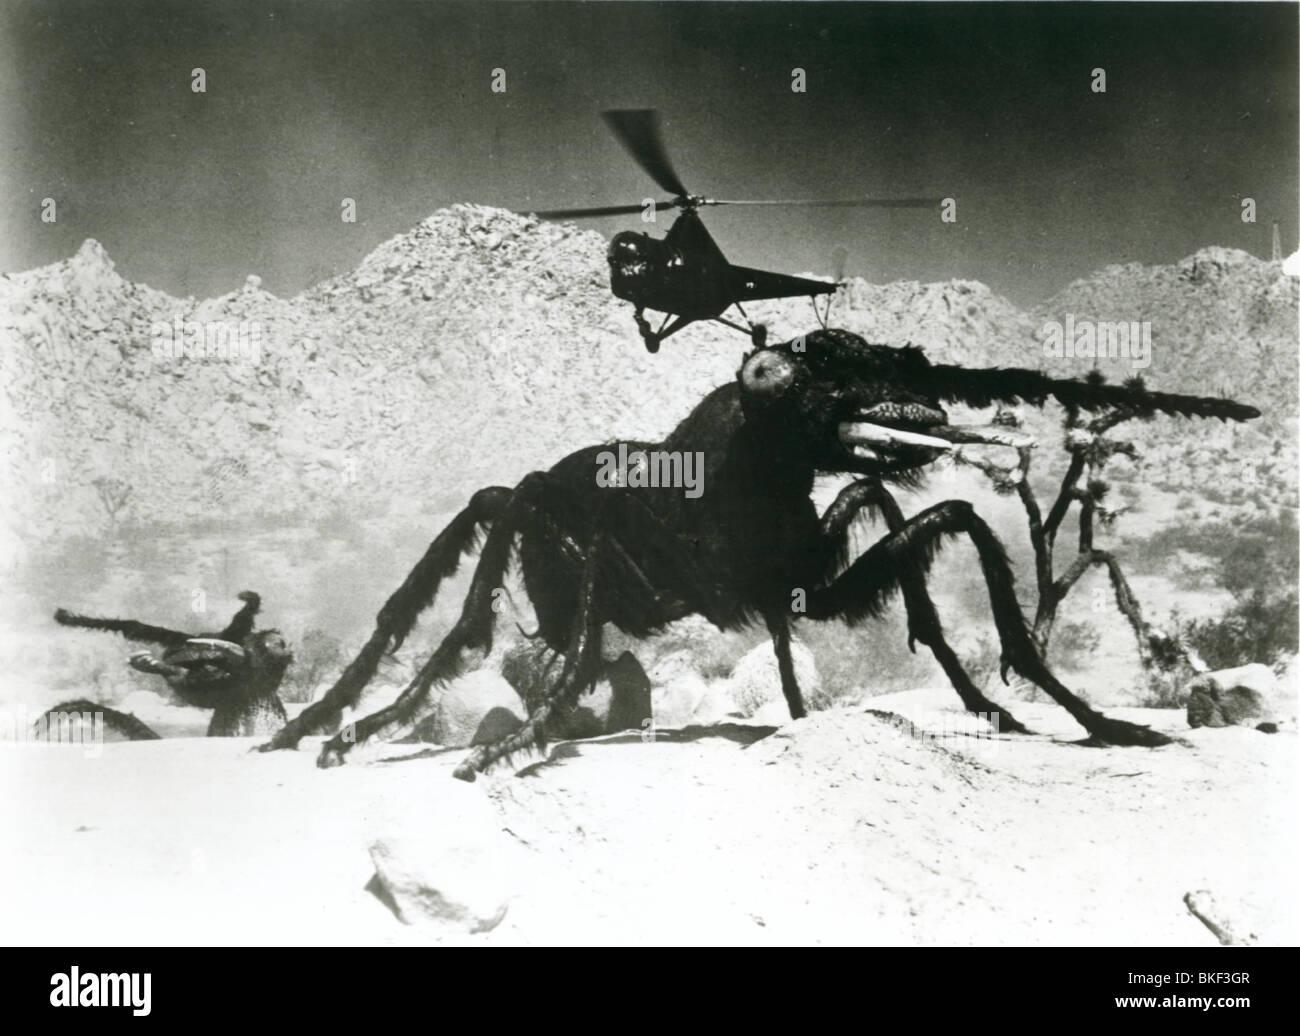 THEM! -1954 - Stock Image